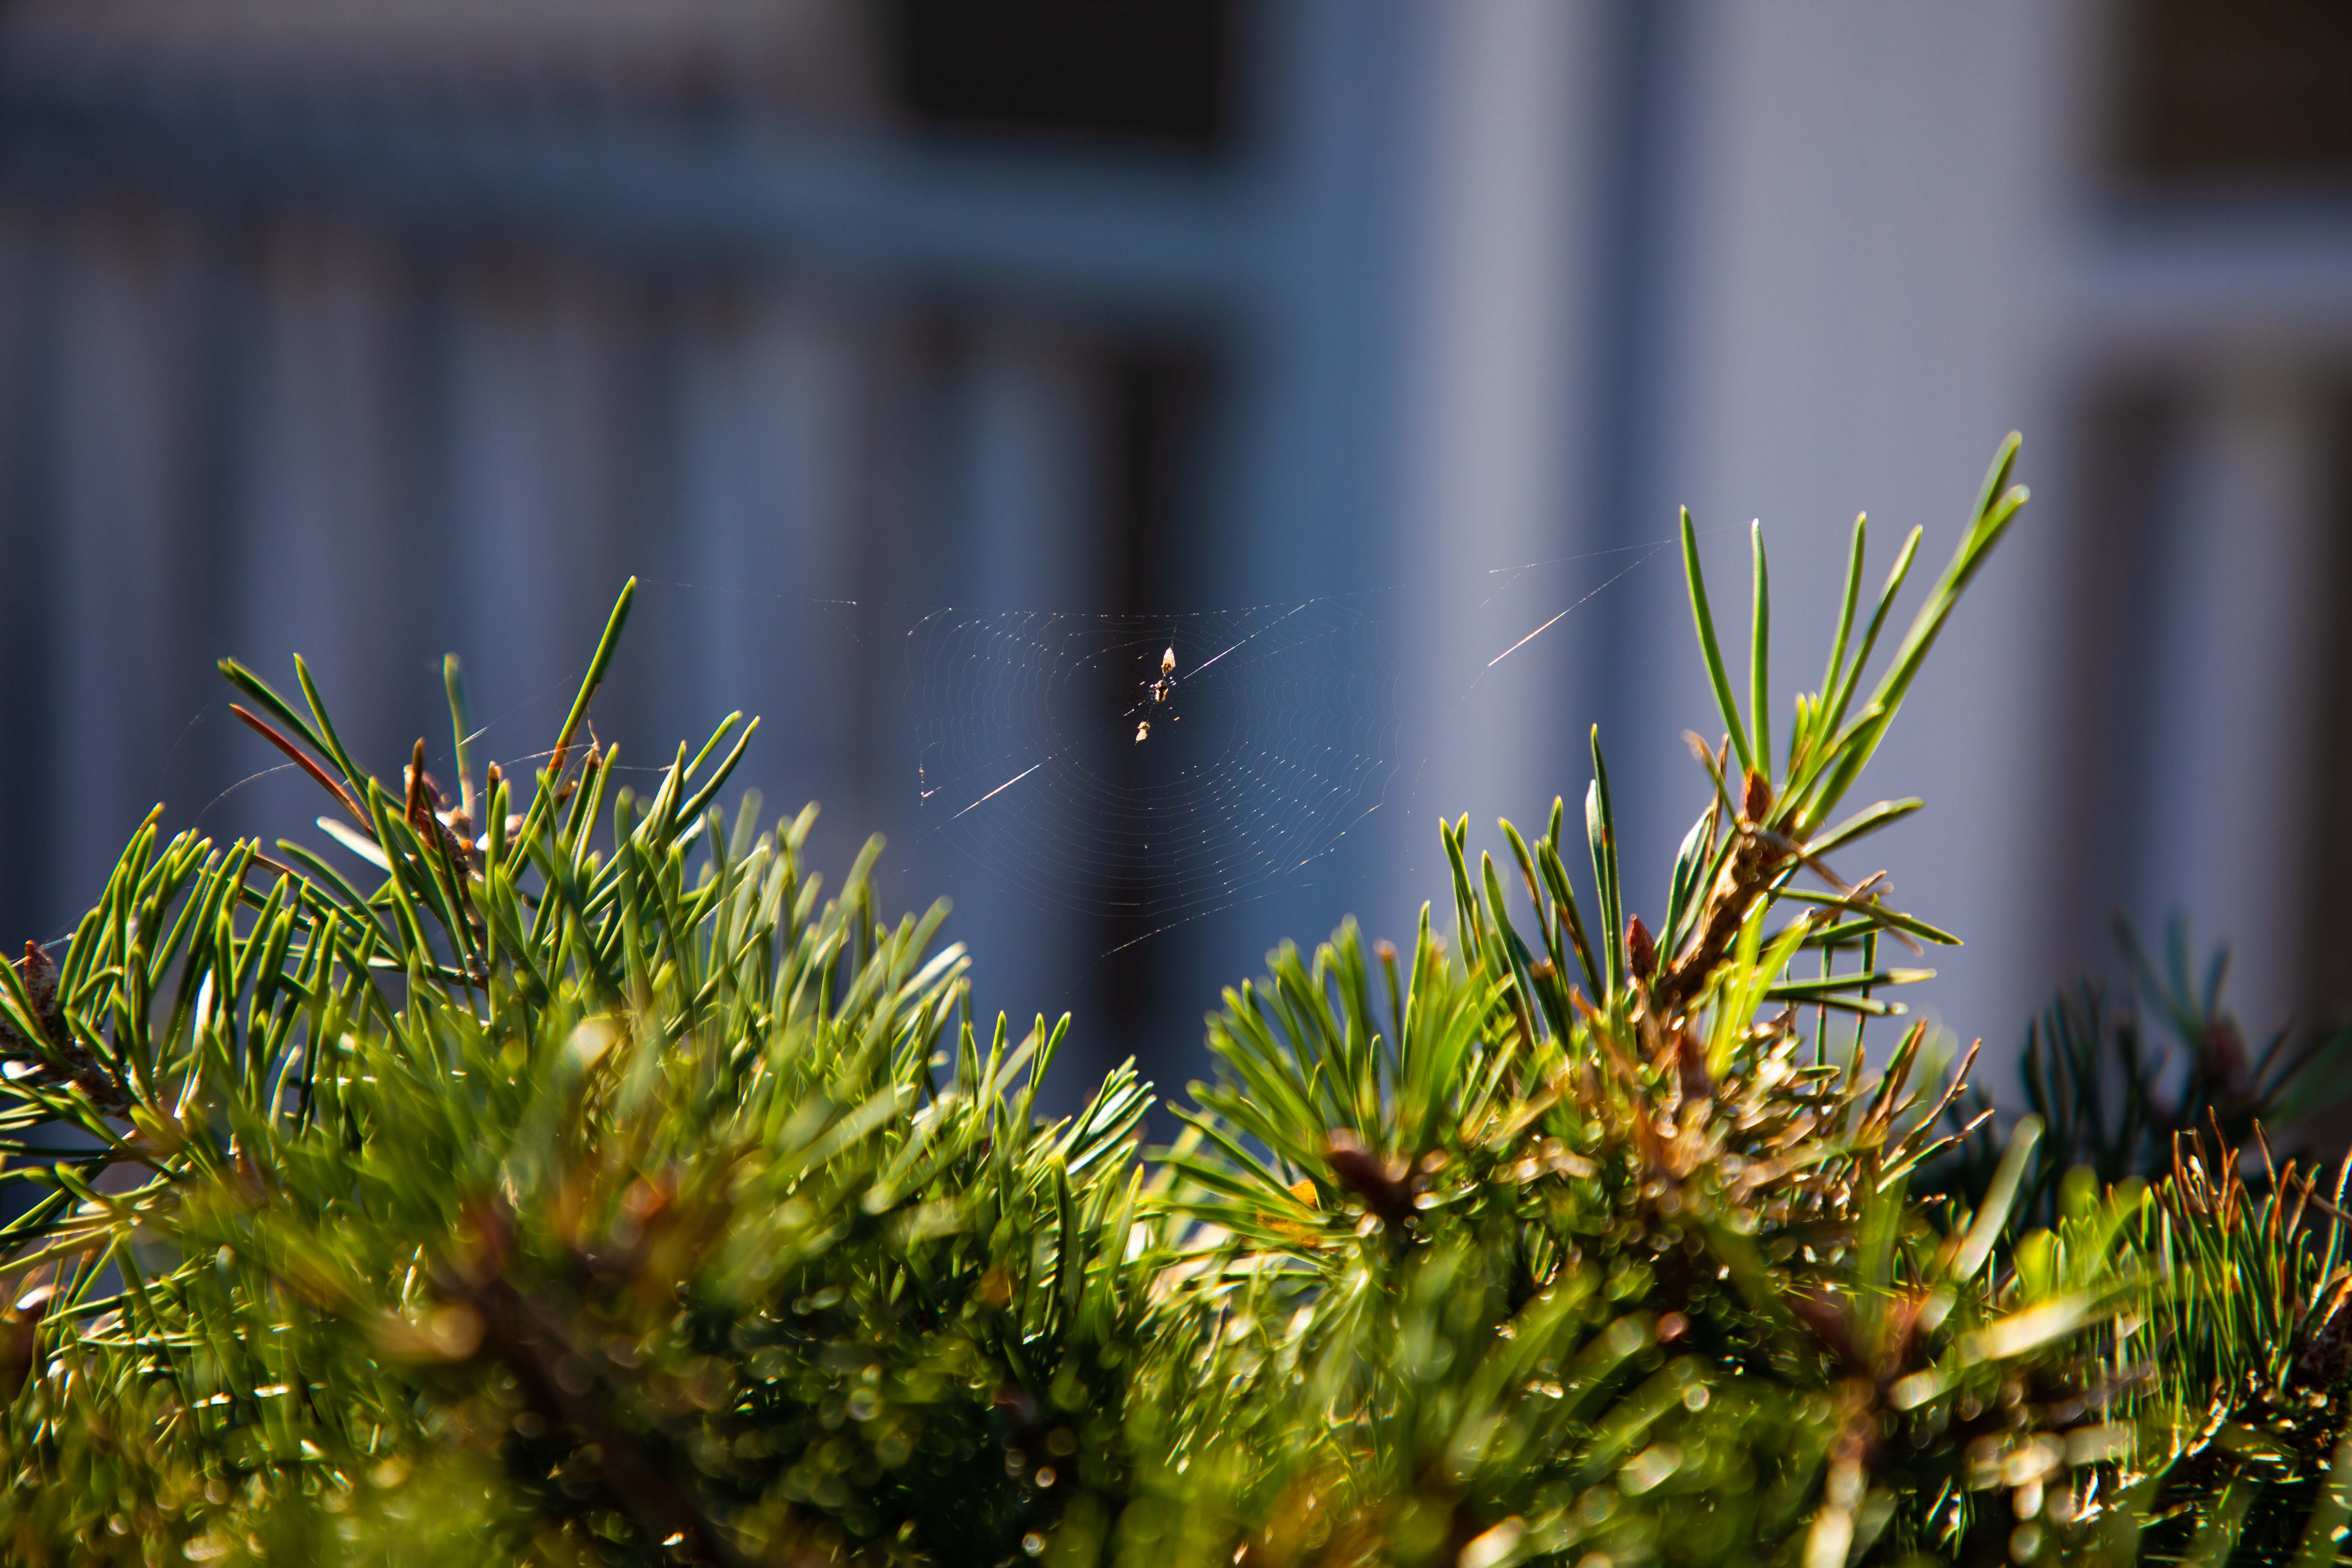 Cobweb of Creation